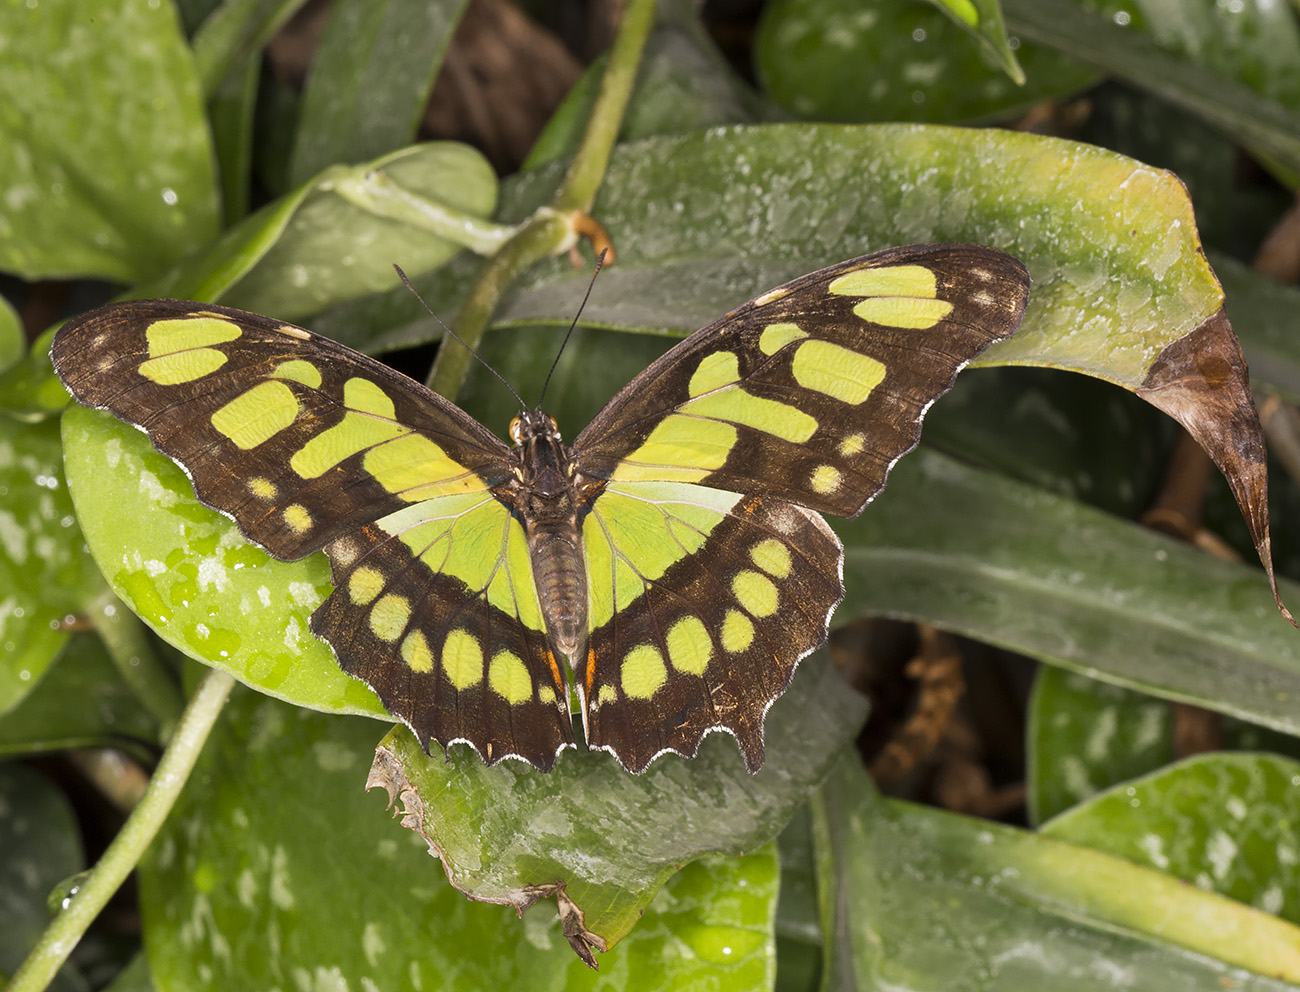 Malachite, Siproeta stelenes.  Wisley Gardens, Butterflies in the Glasshouse, 10 February 2015.